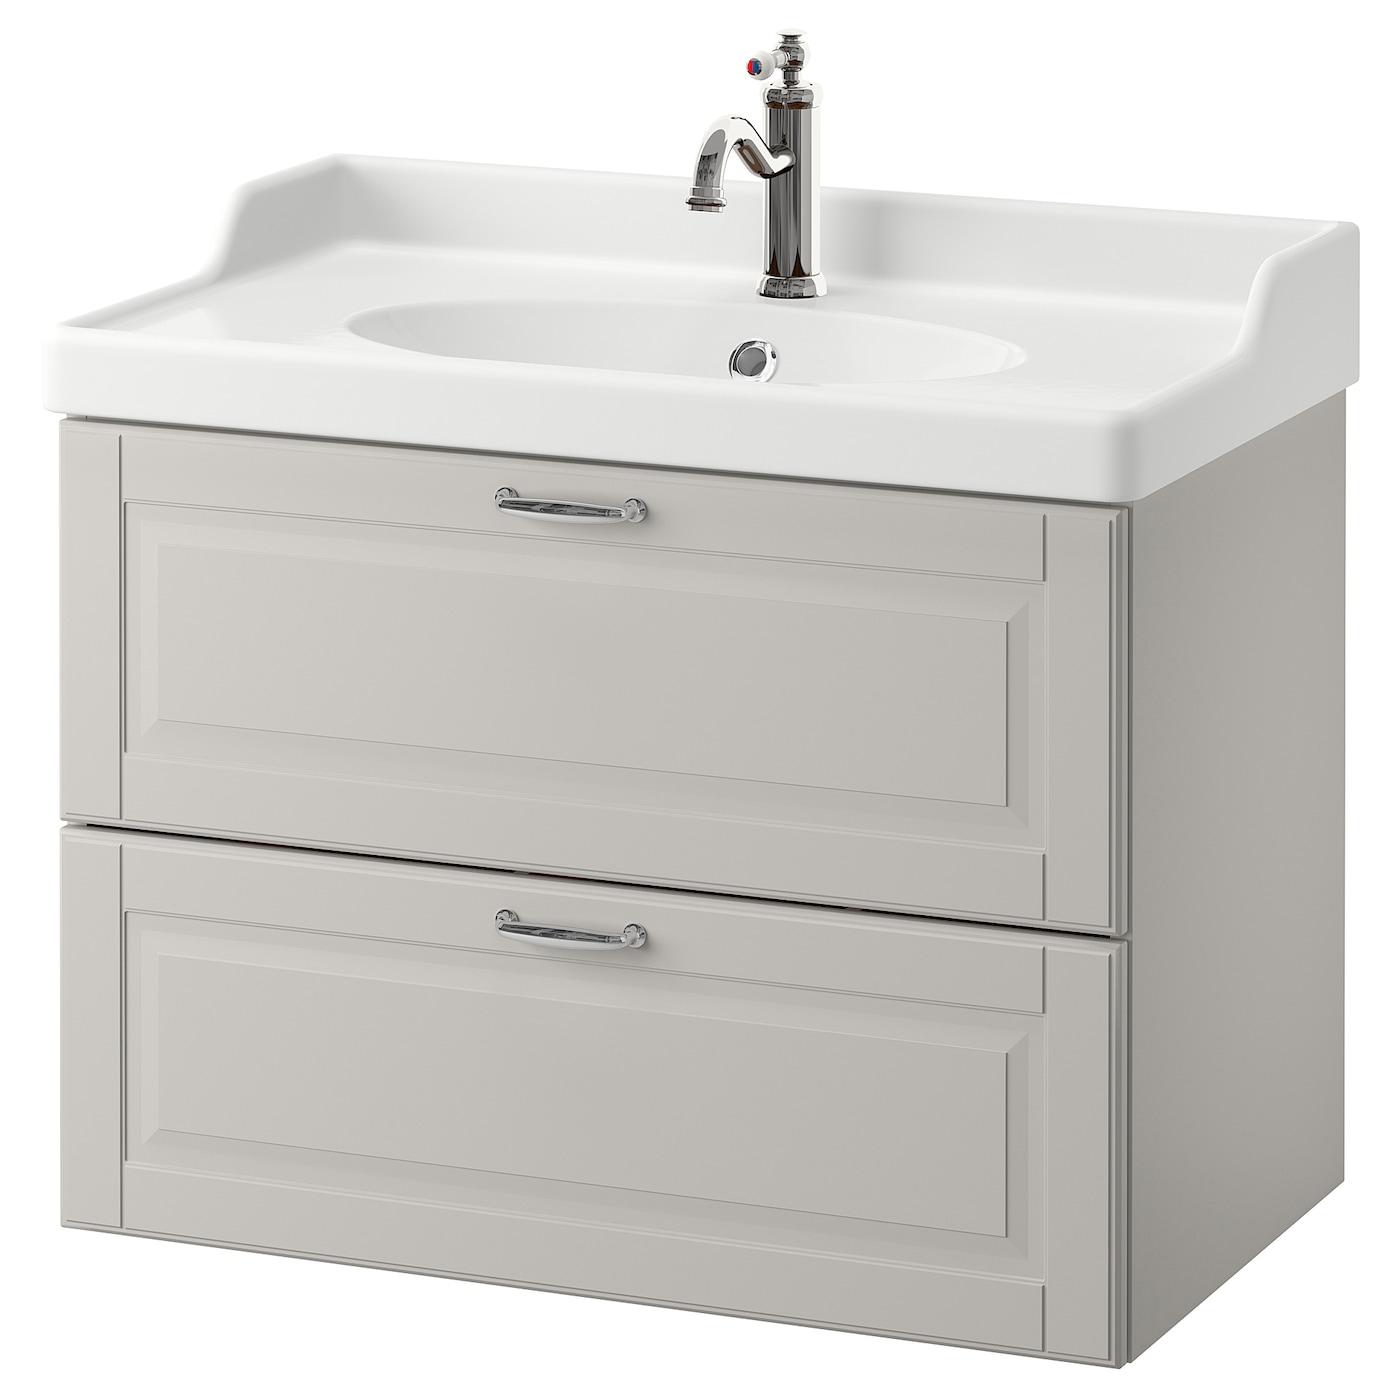 GODMORGON/RÄTTVIKEN Wash-stand with 2 drawers Kasjön light ...